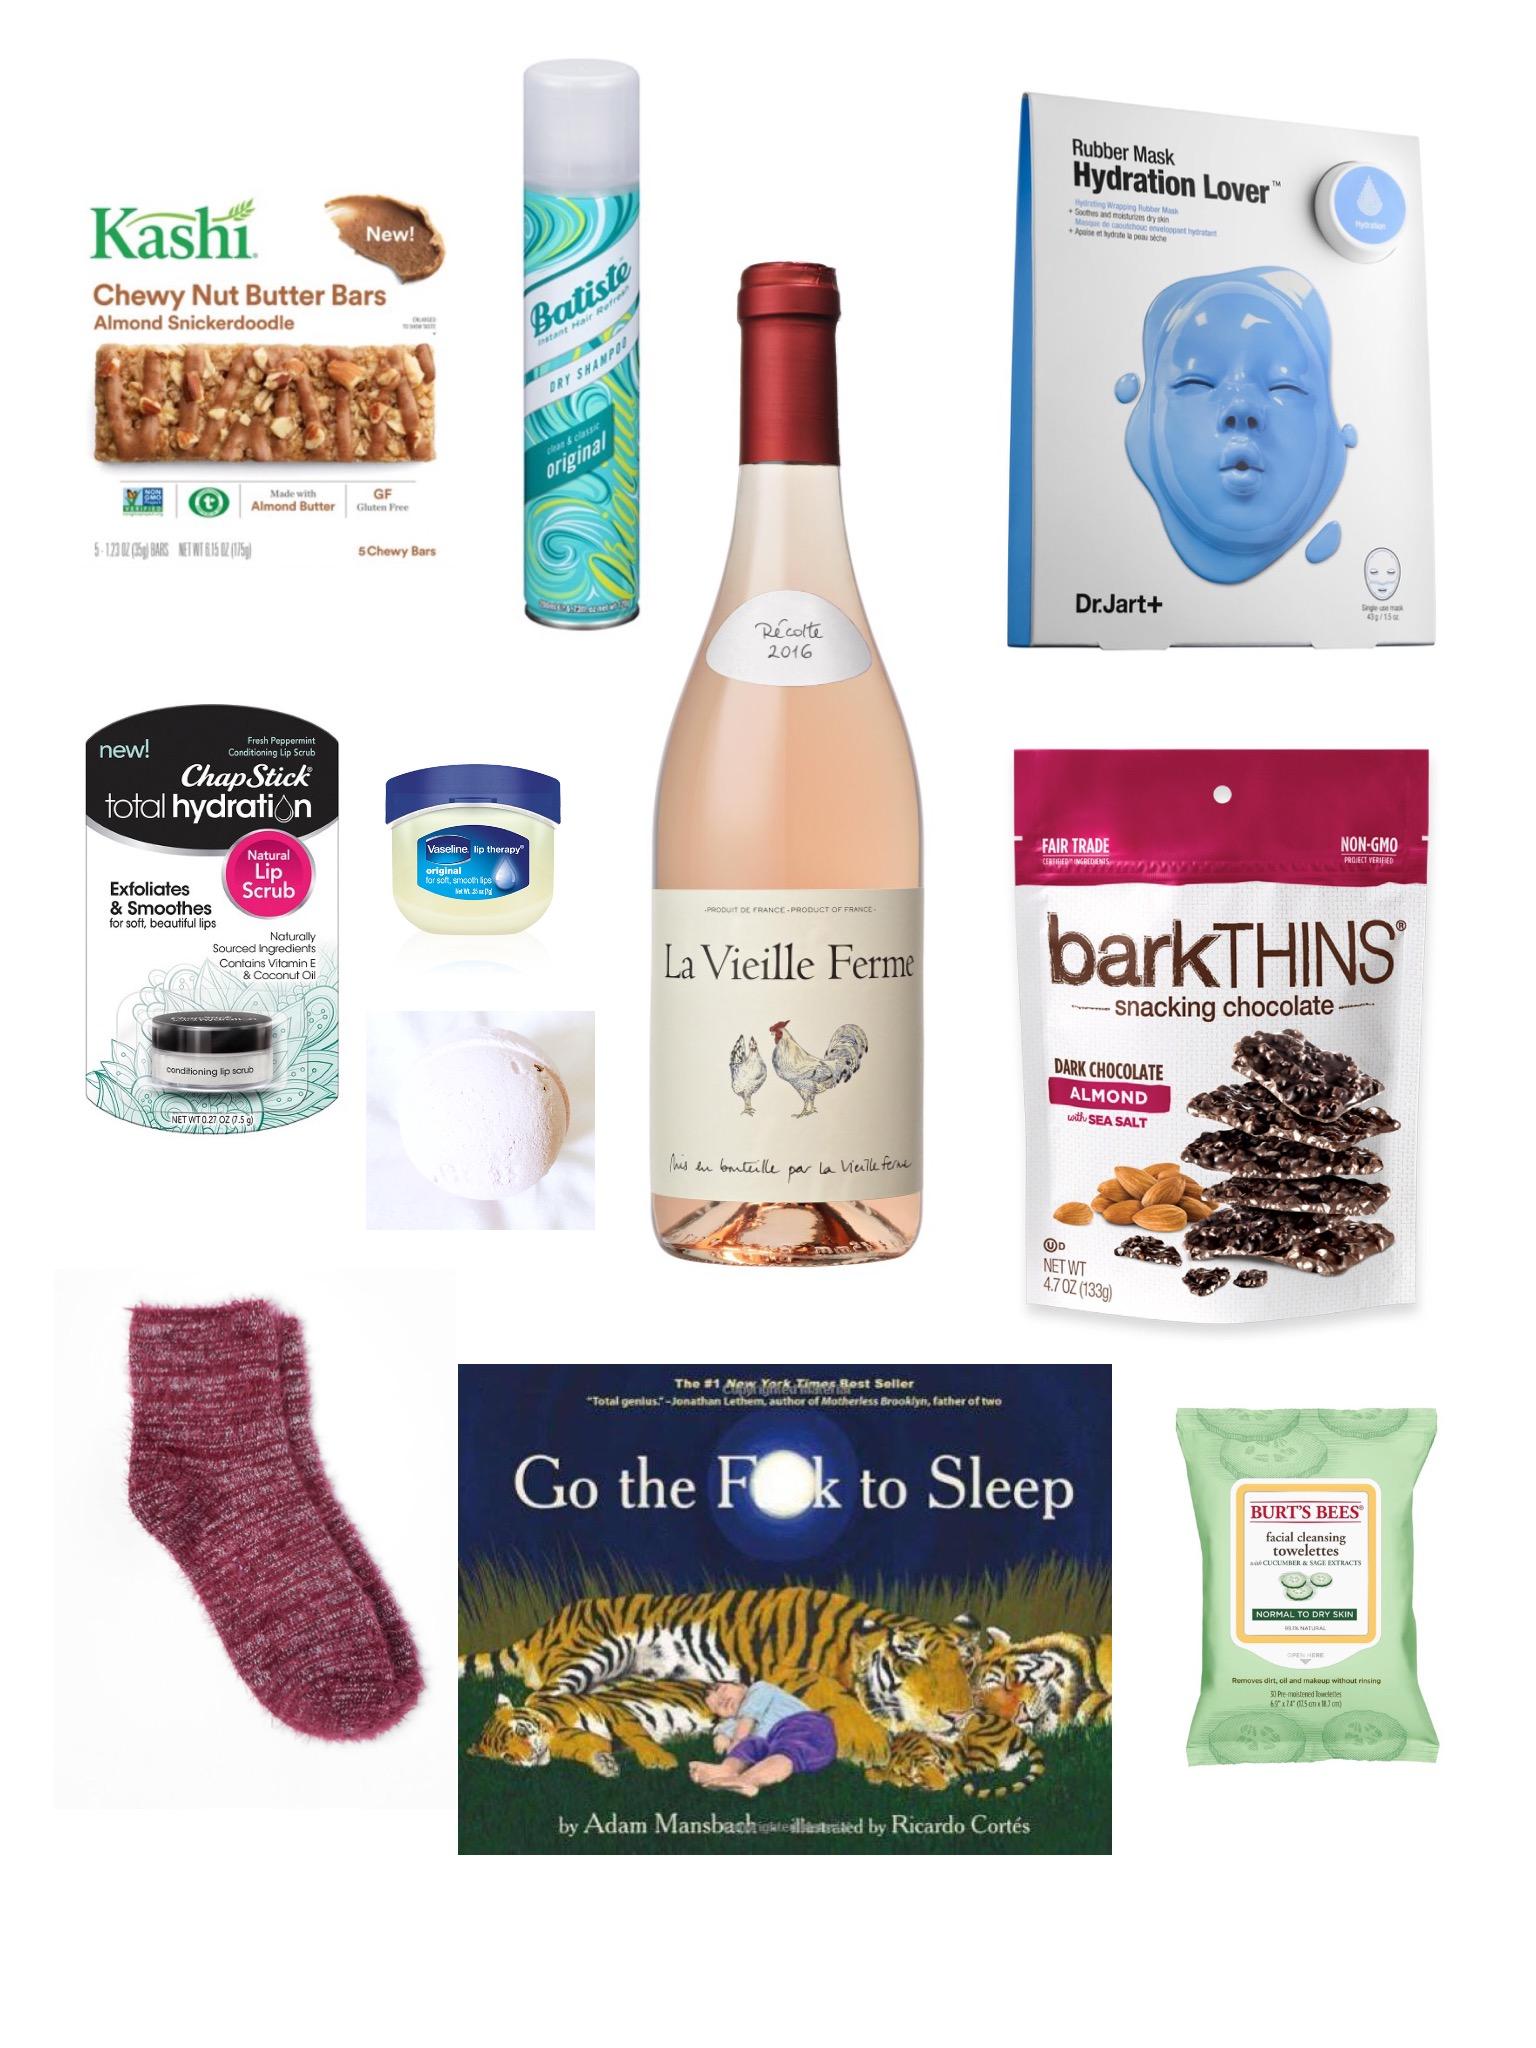 Twenty Two Lane - New Mama Gift Ideas